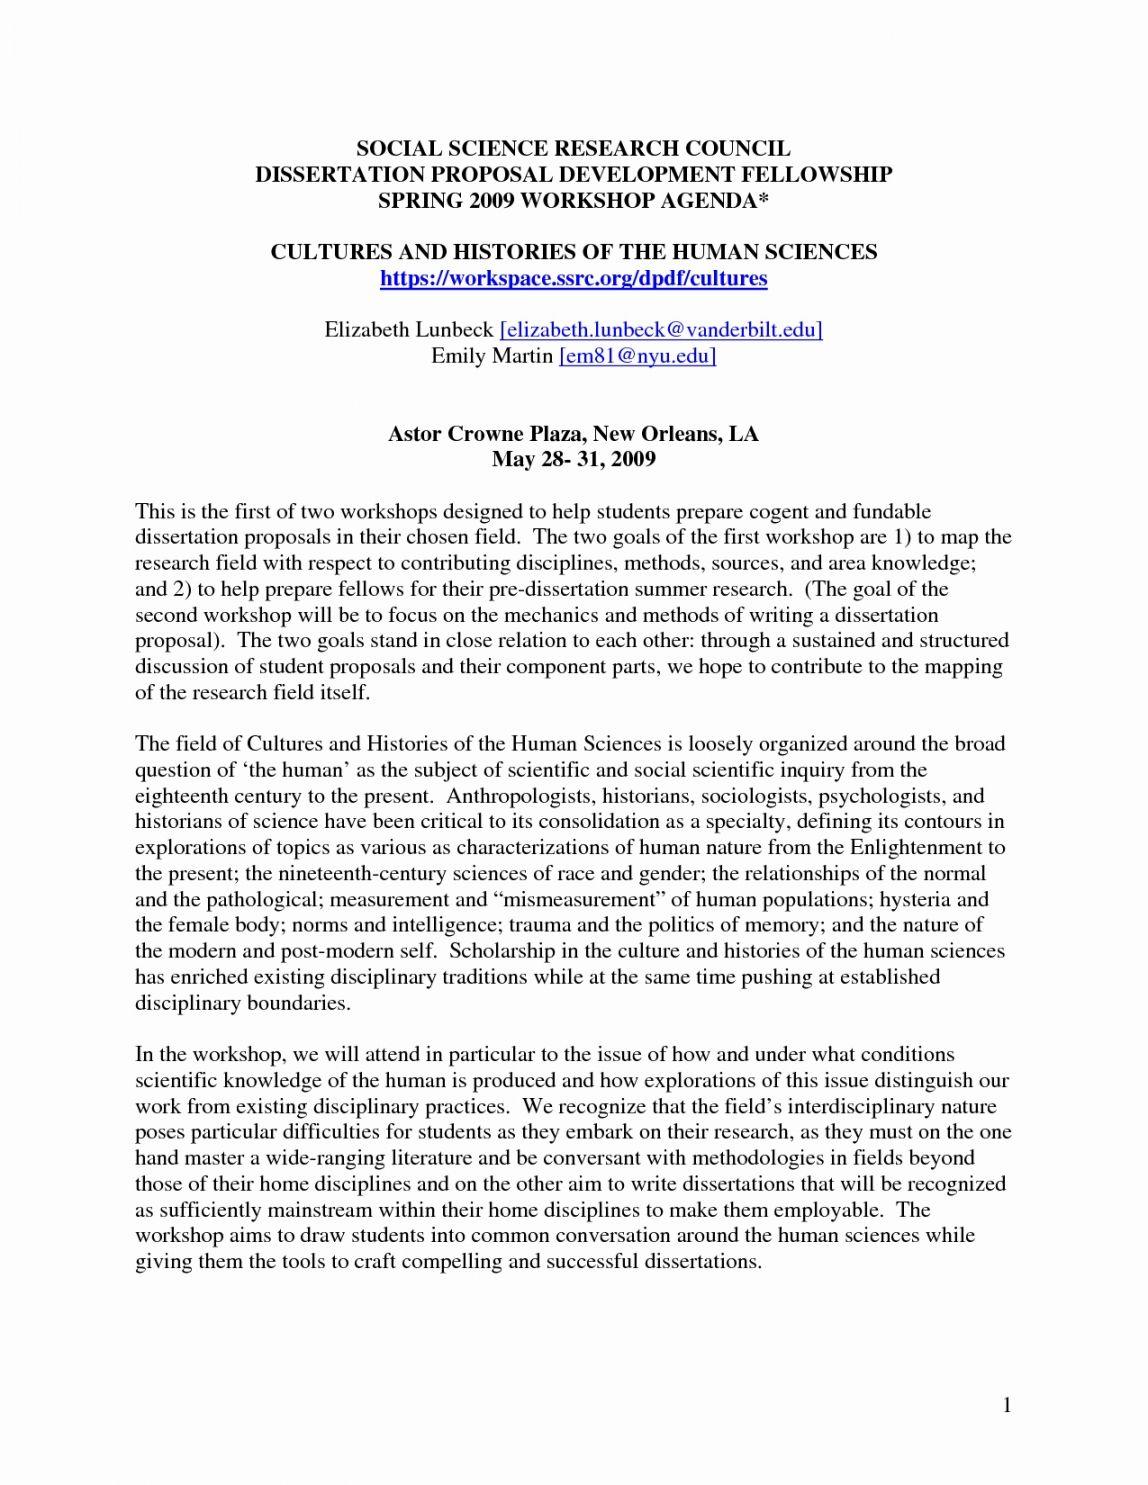 Marketing Research Proposal Template Ssrc Dissertation Fellowship